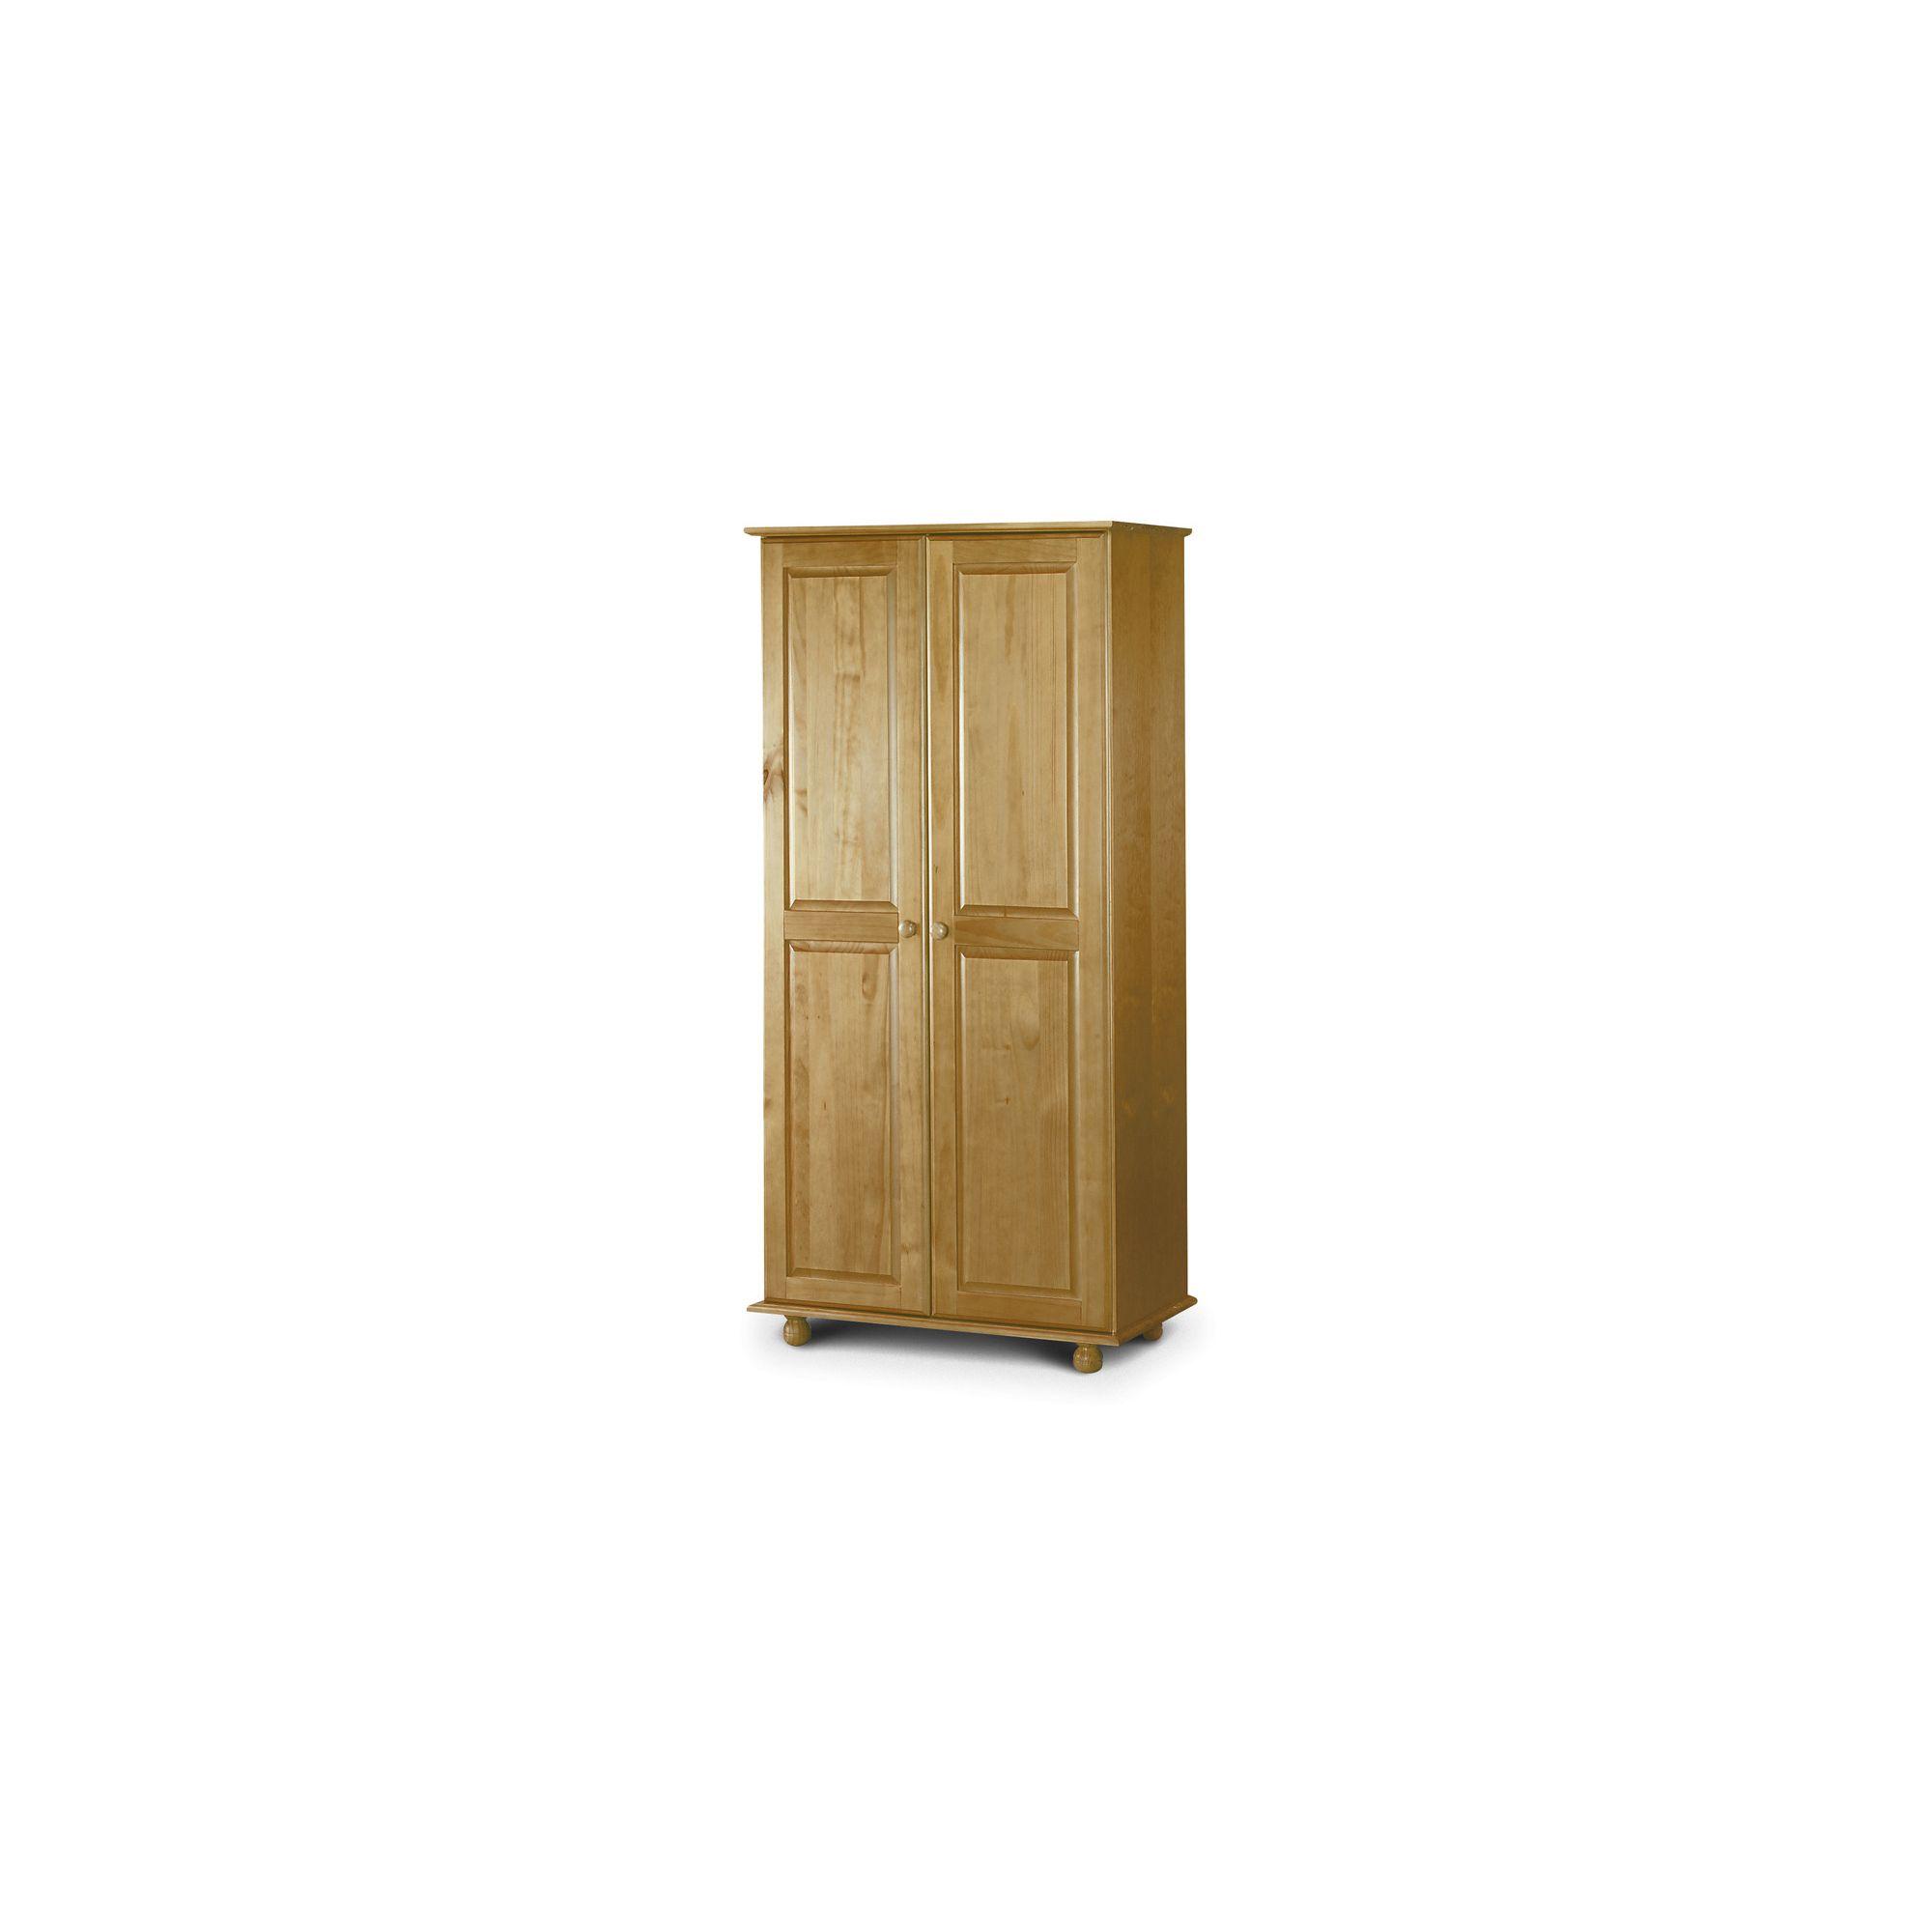 Julian Bowen Pickwick 2 Door All Hanging Wardrobe in Solid Pine at Tesco Direct